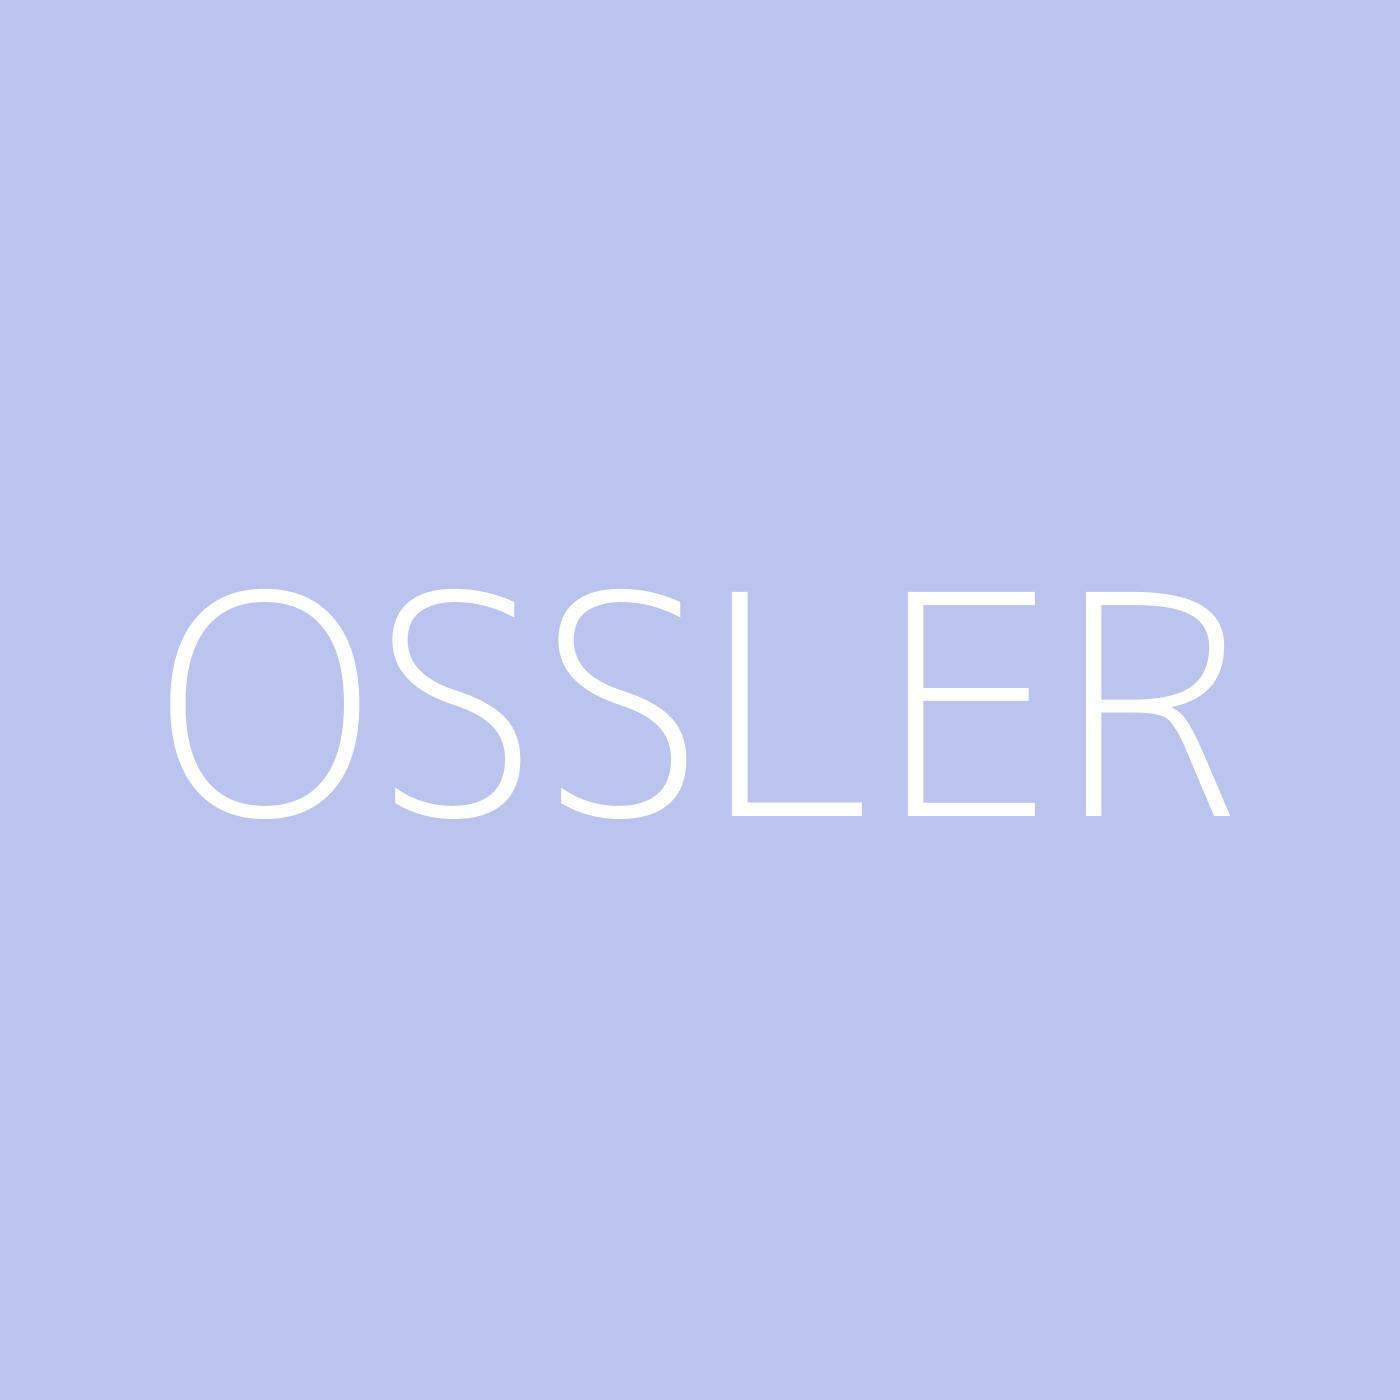 Ossler Playlist Artwork